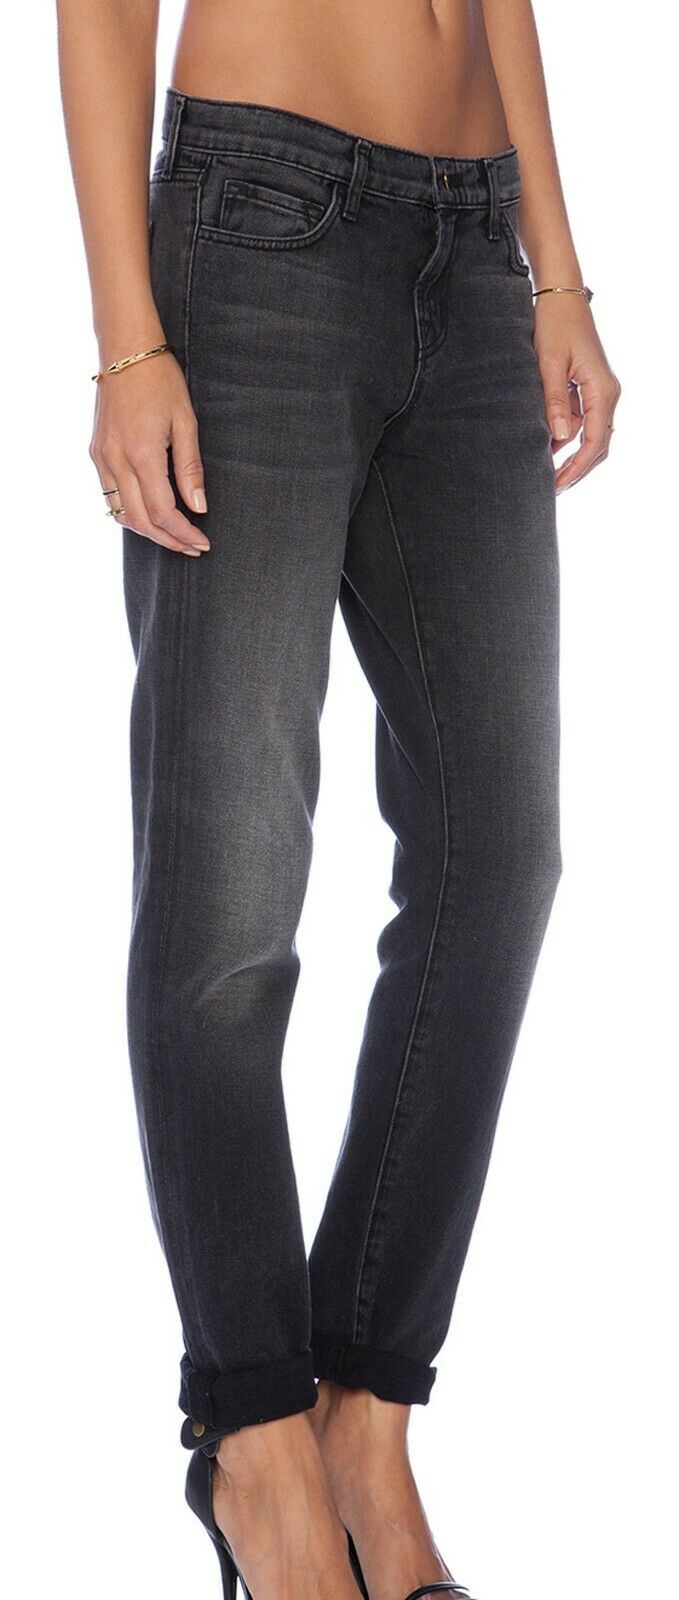 New with Tag -  220 J BRAND Jake Slim Boyfriend Jeans in Serene Size 22